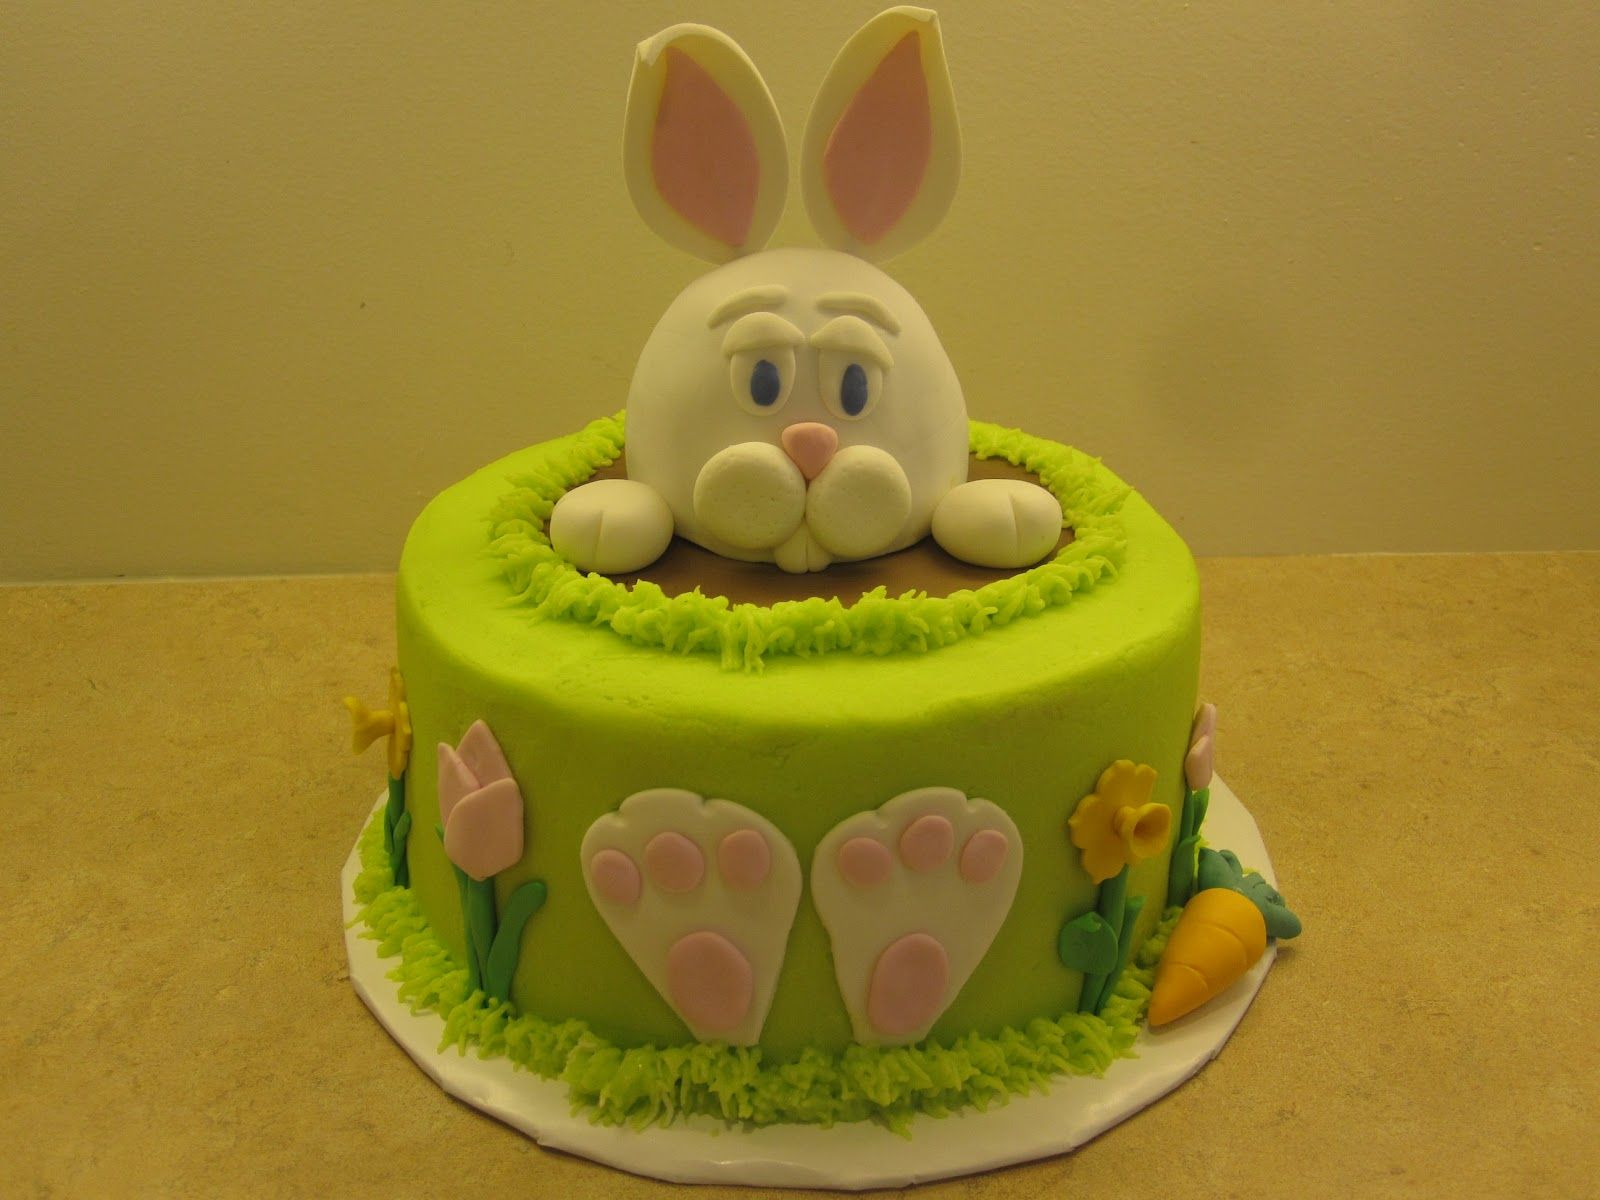 rabbit cake | ... bunny cake base cake is are 8 inch round cakes ...